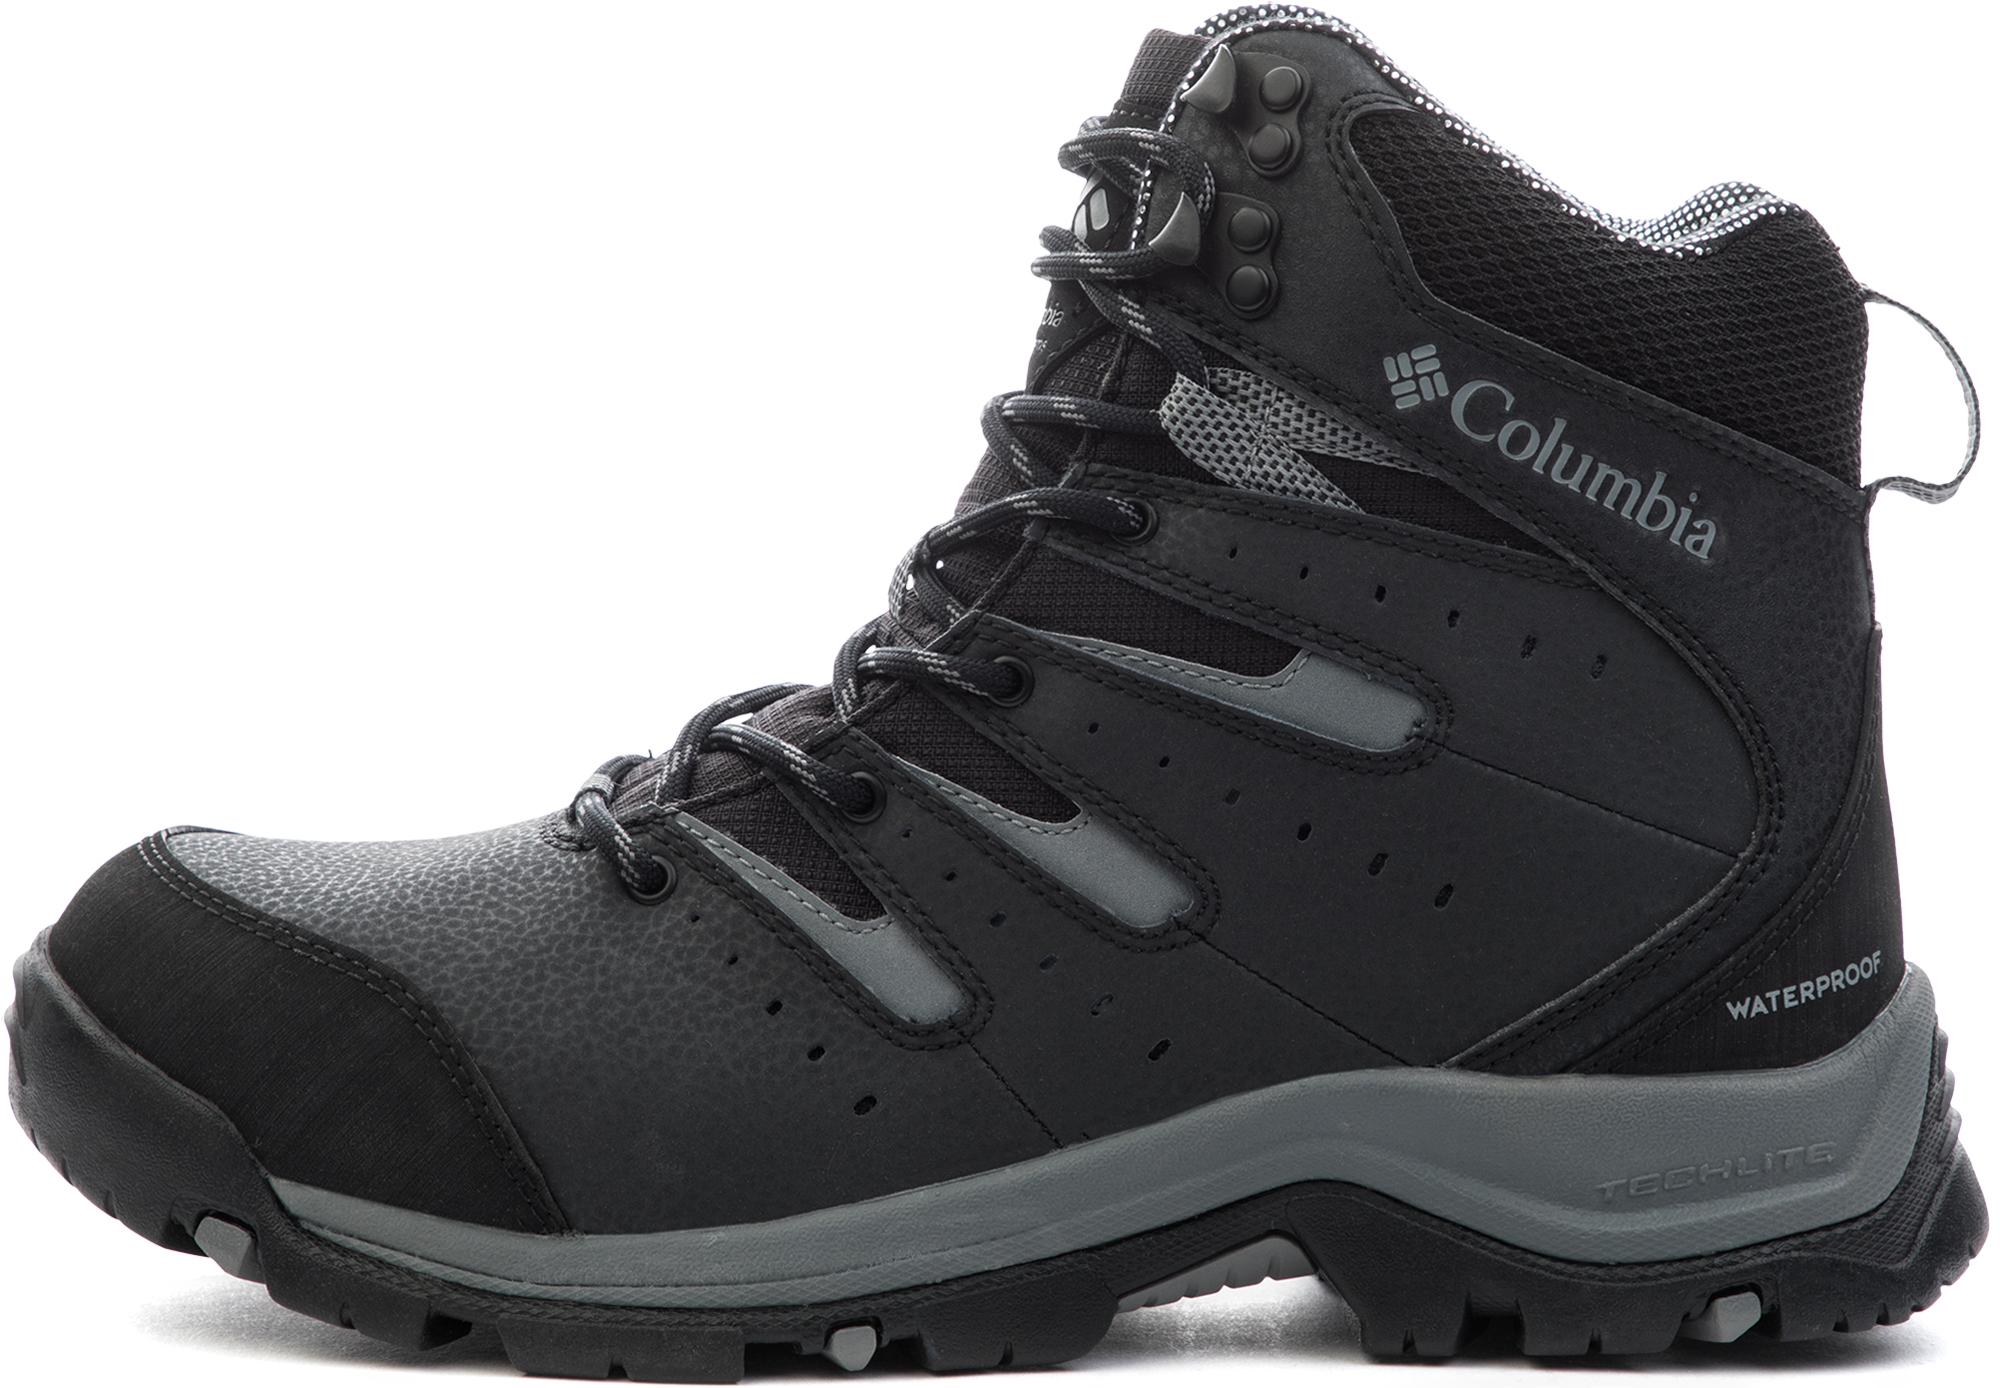 цена Columbia Ботинки утепленные мужские Columbia Gunnison II, размер 43.5 онлайн в 2017 году